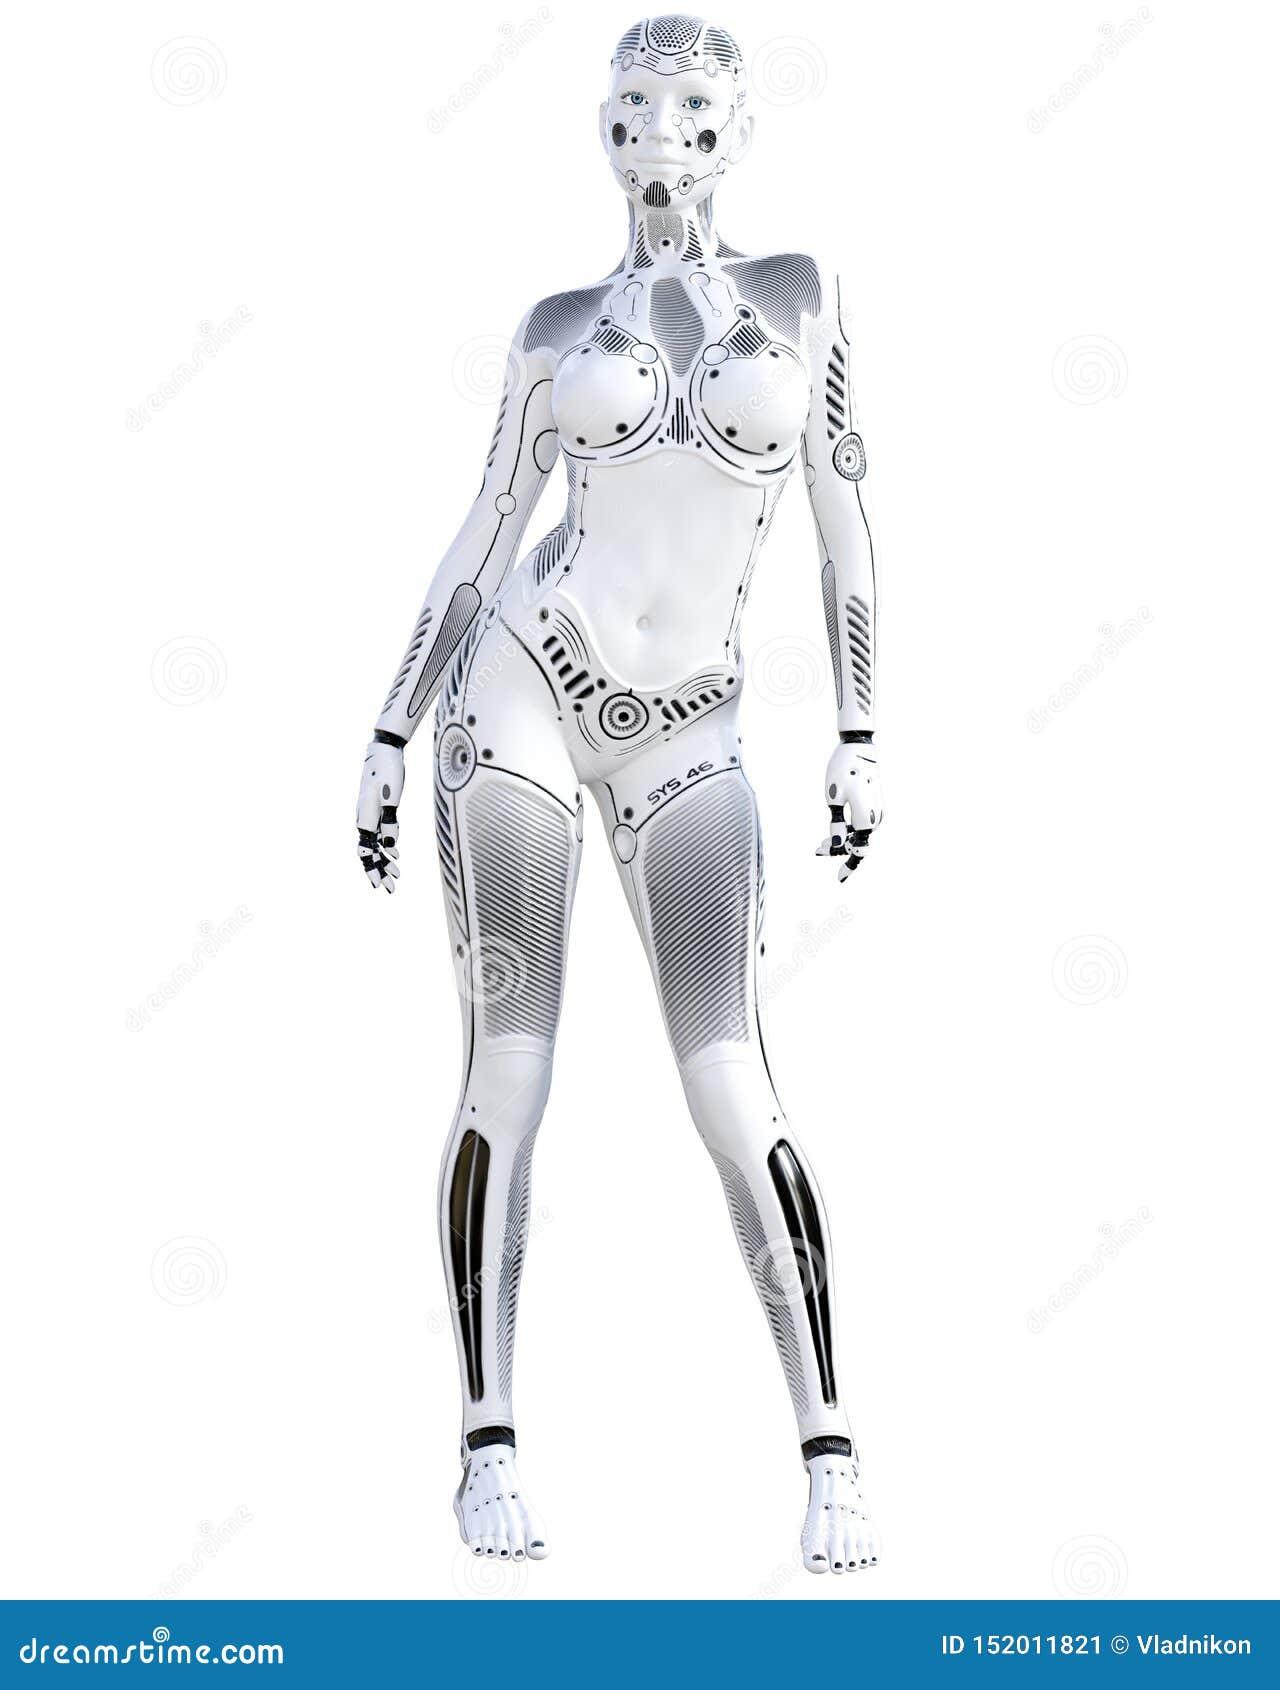 Robotkvinna Droid f?r vit metall konstgjord intelligens